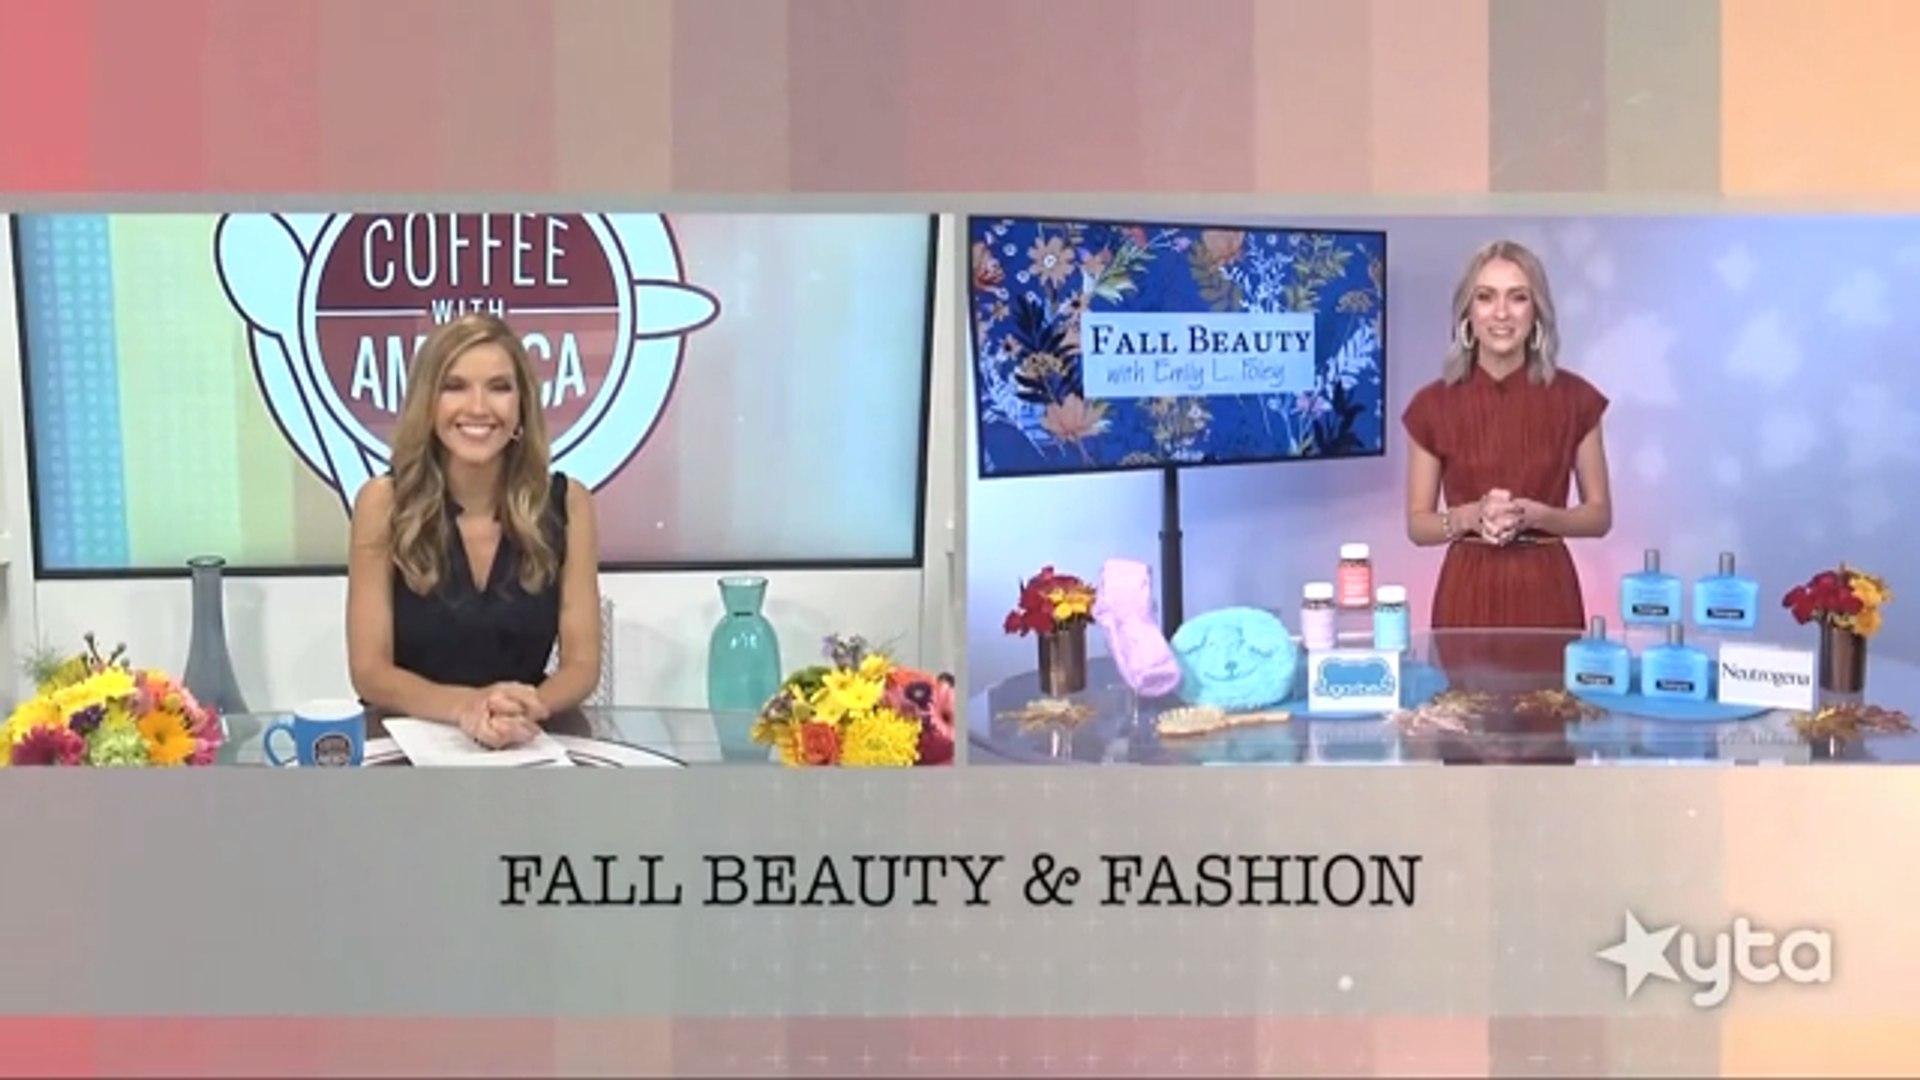 Fall Beauty & Fashion